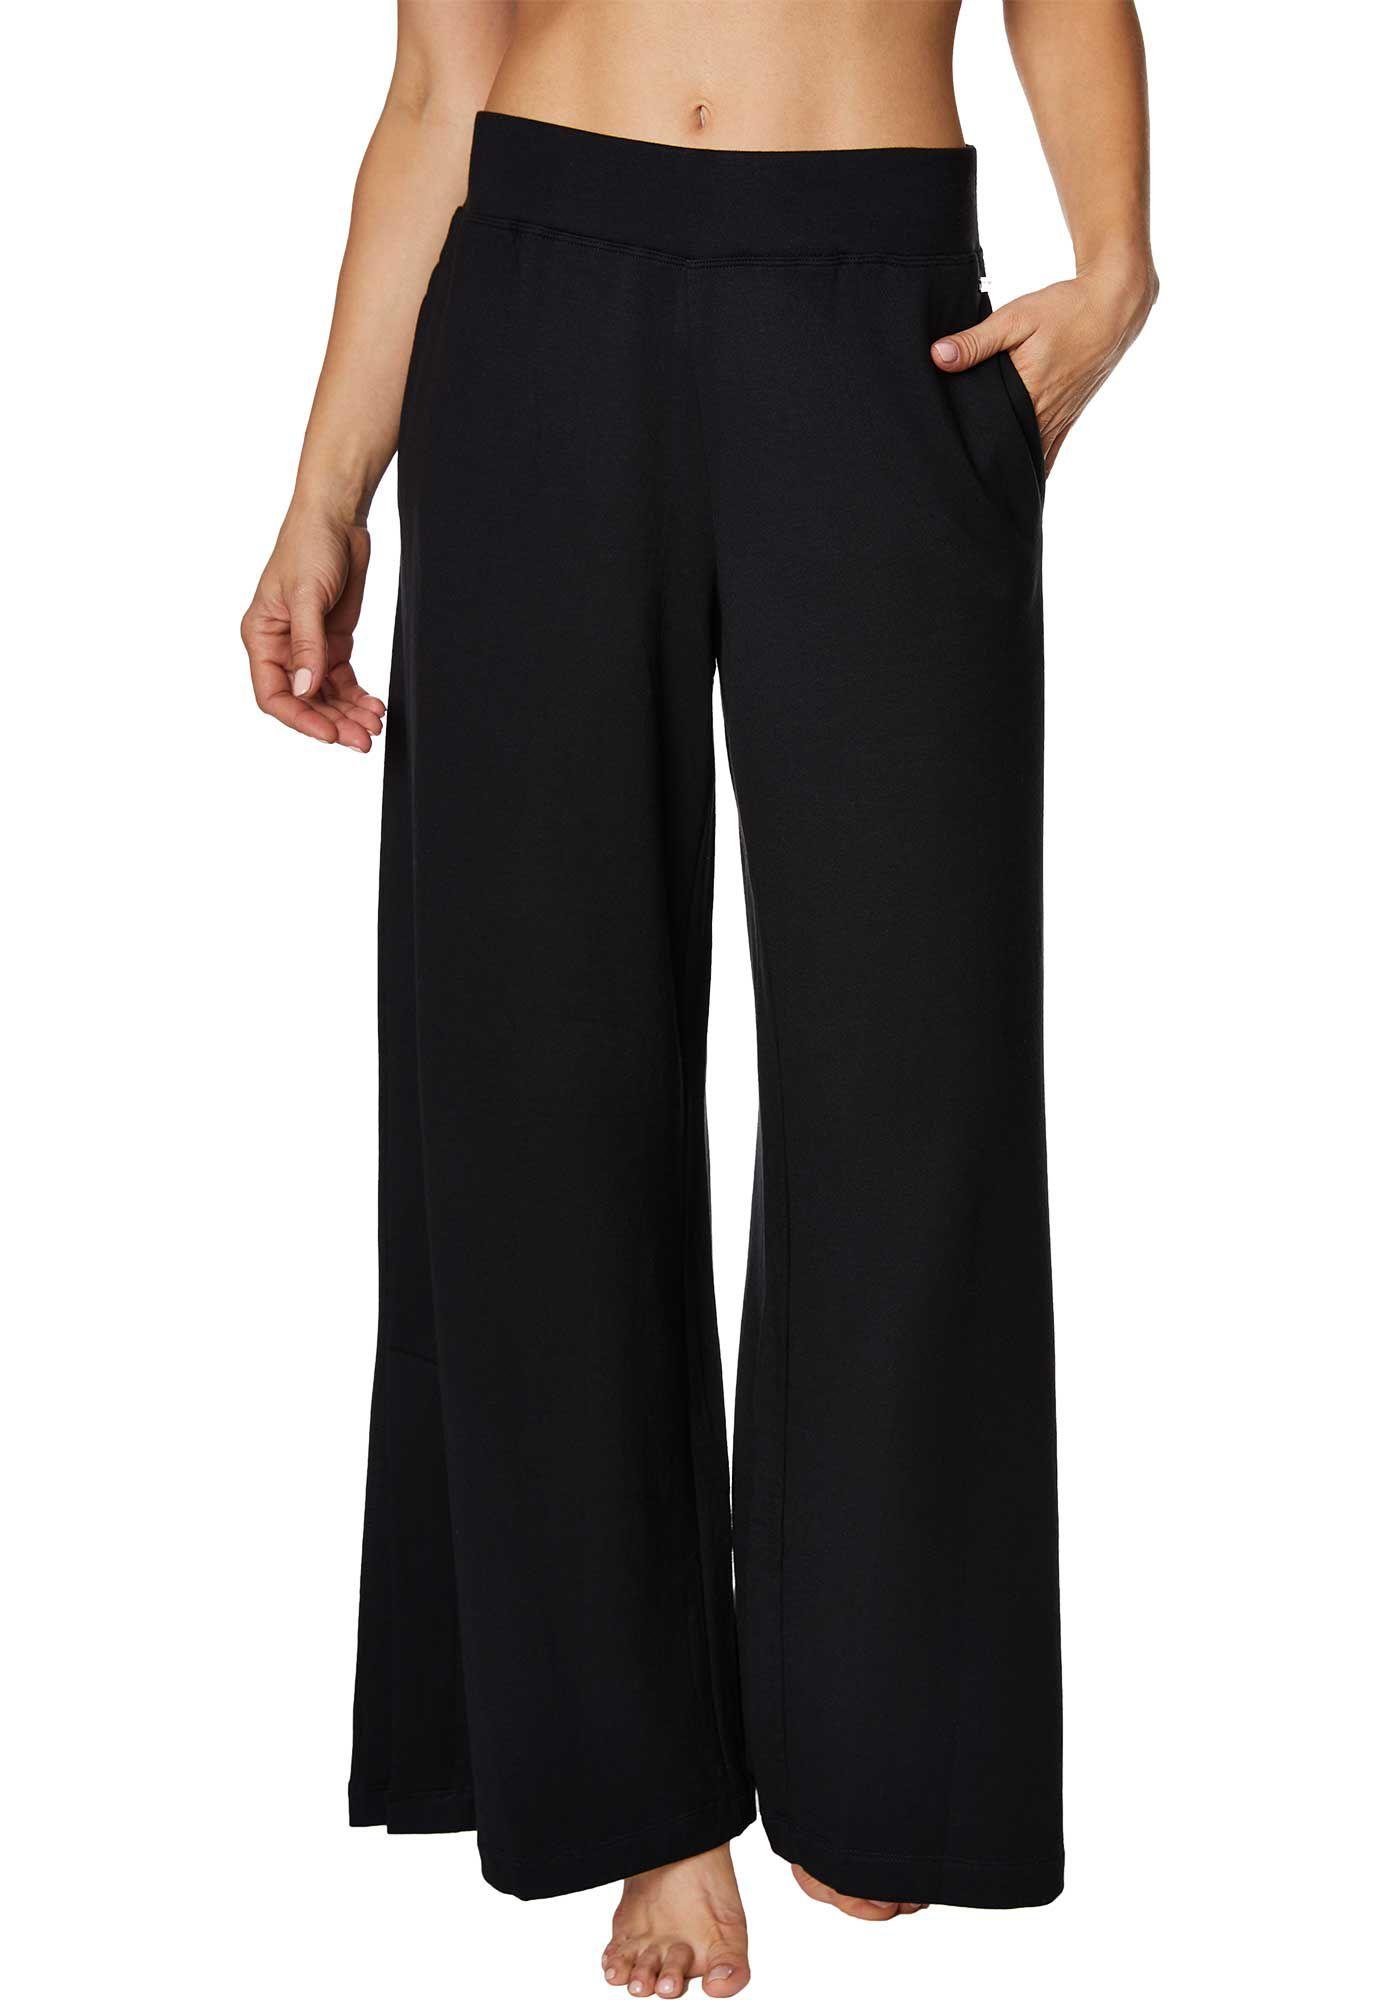 Betsey Johnson Women's Wide Leg Side Slit Pants